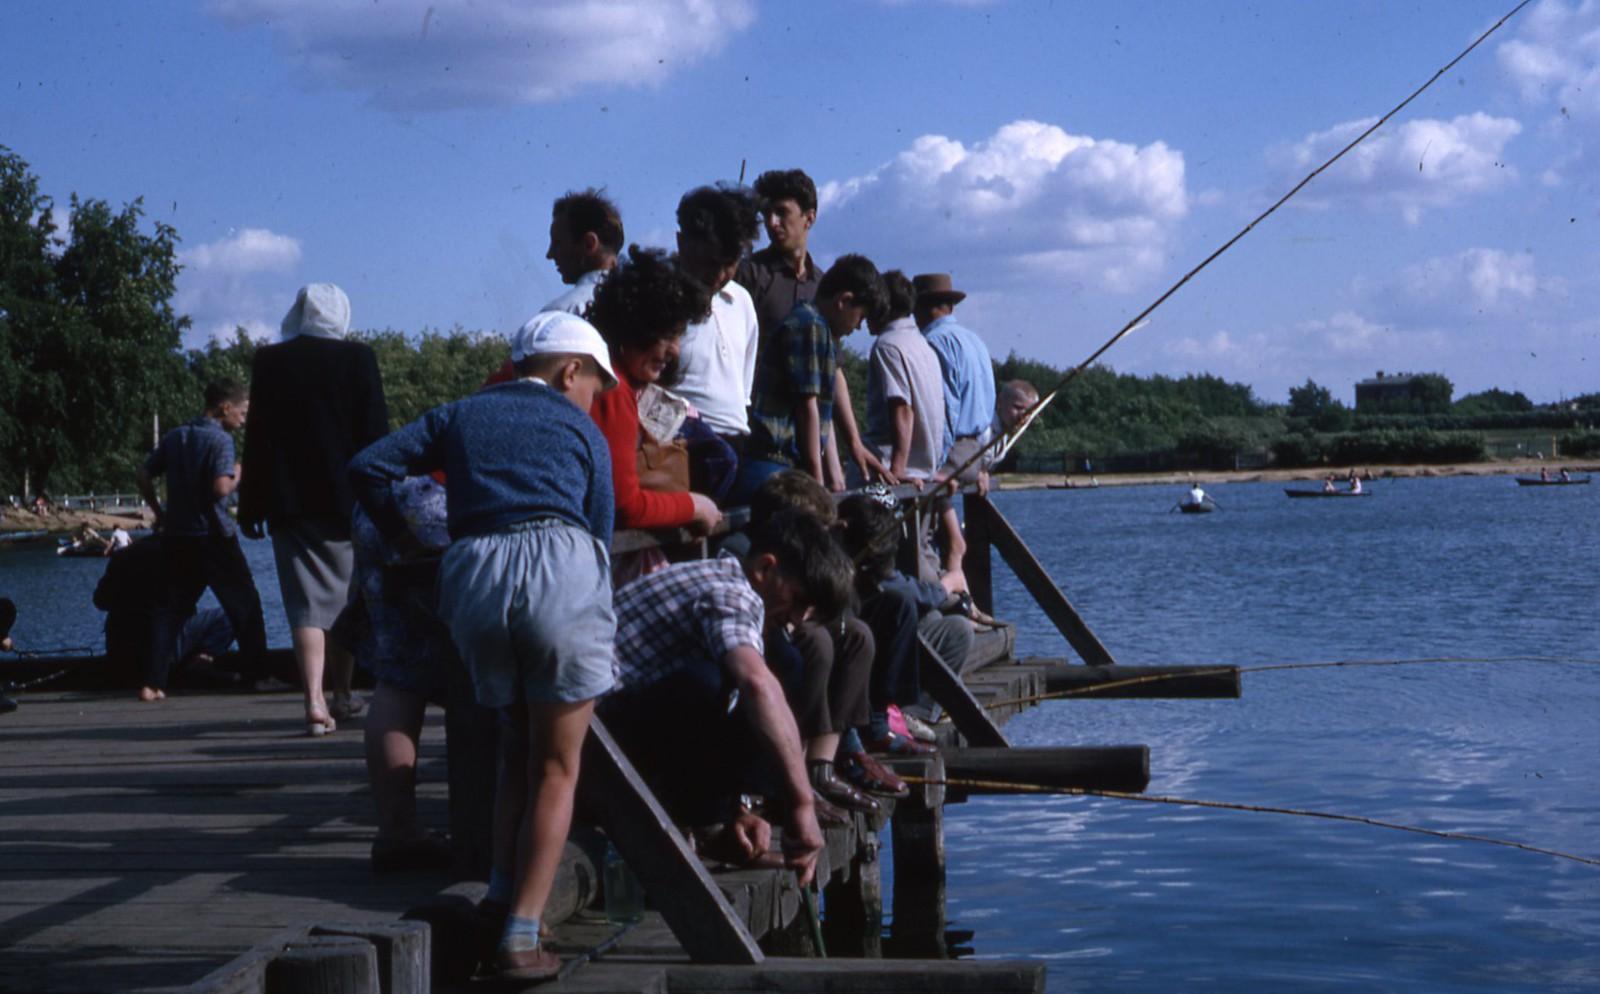 hammond-MA10-Ostankino-people-sunbathing-and-fishing-026